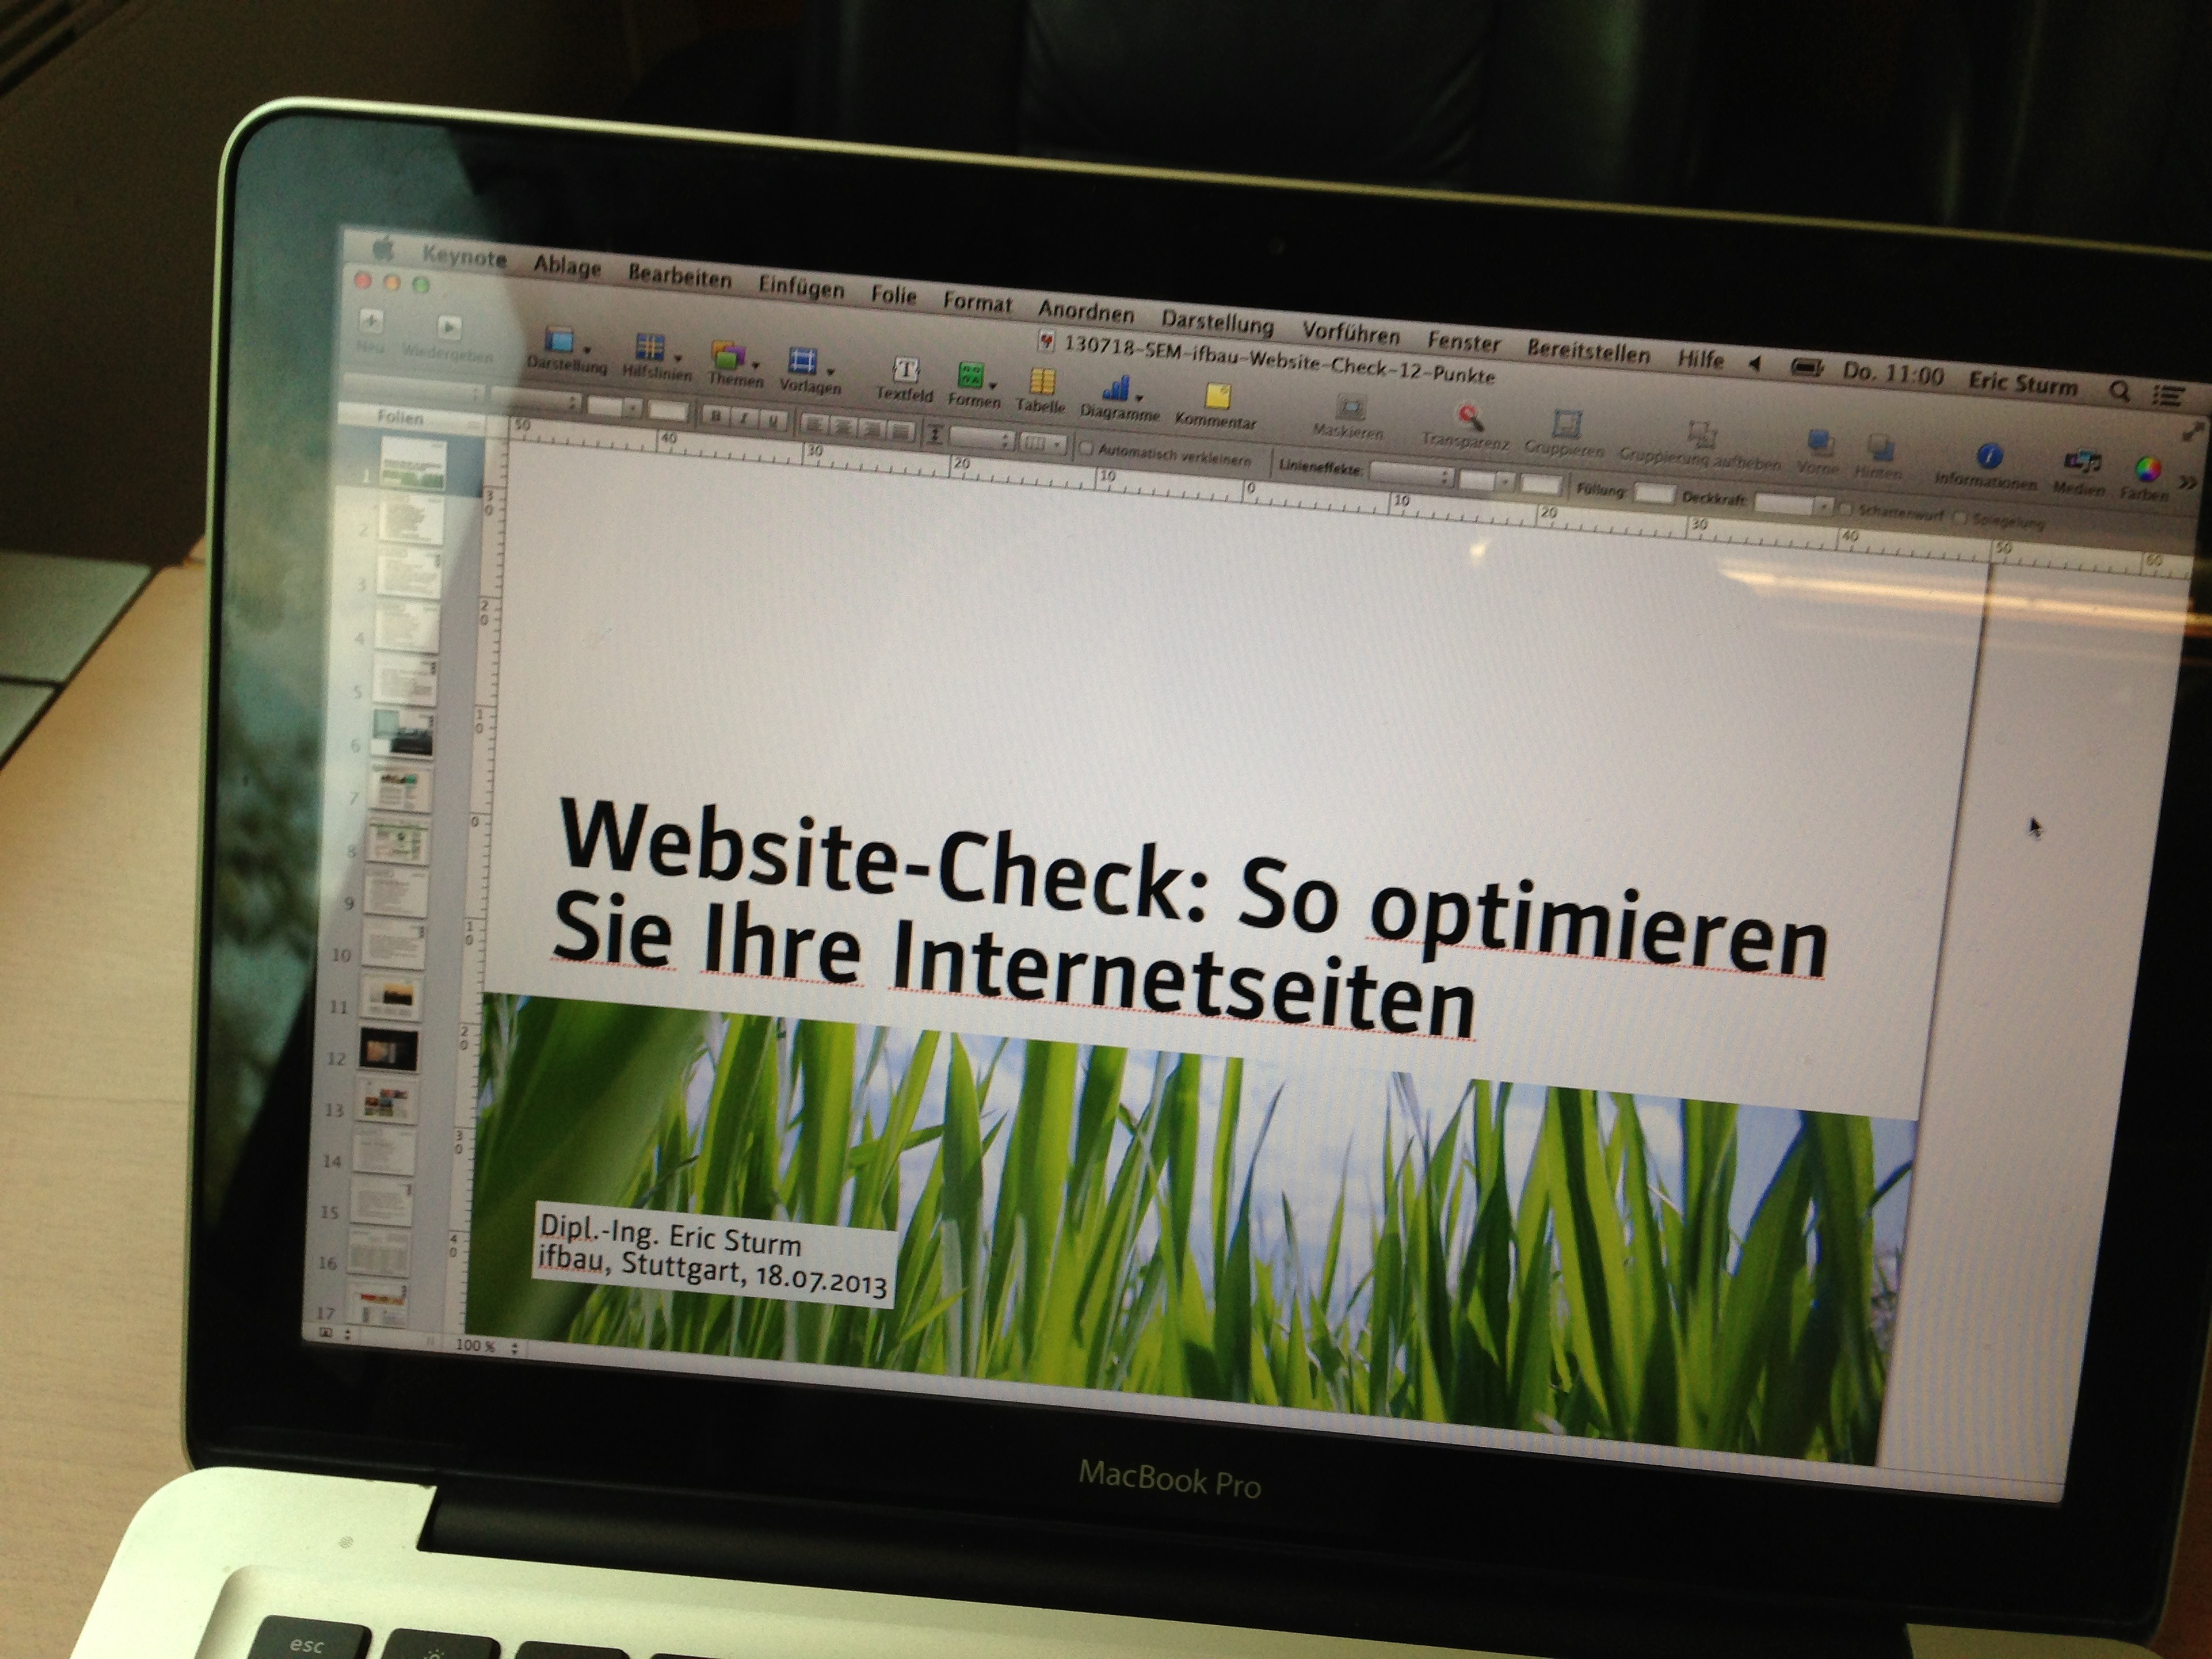 seminar website check ifbau stuttgart internet f r architekten. Black Bedroom Furniture Sets. Home Design Ideas